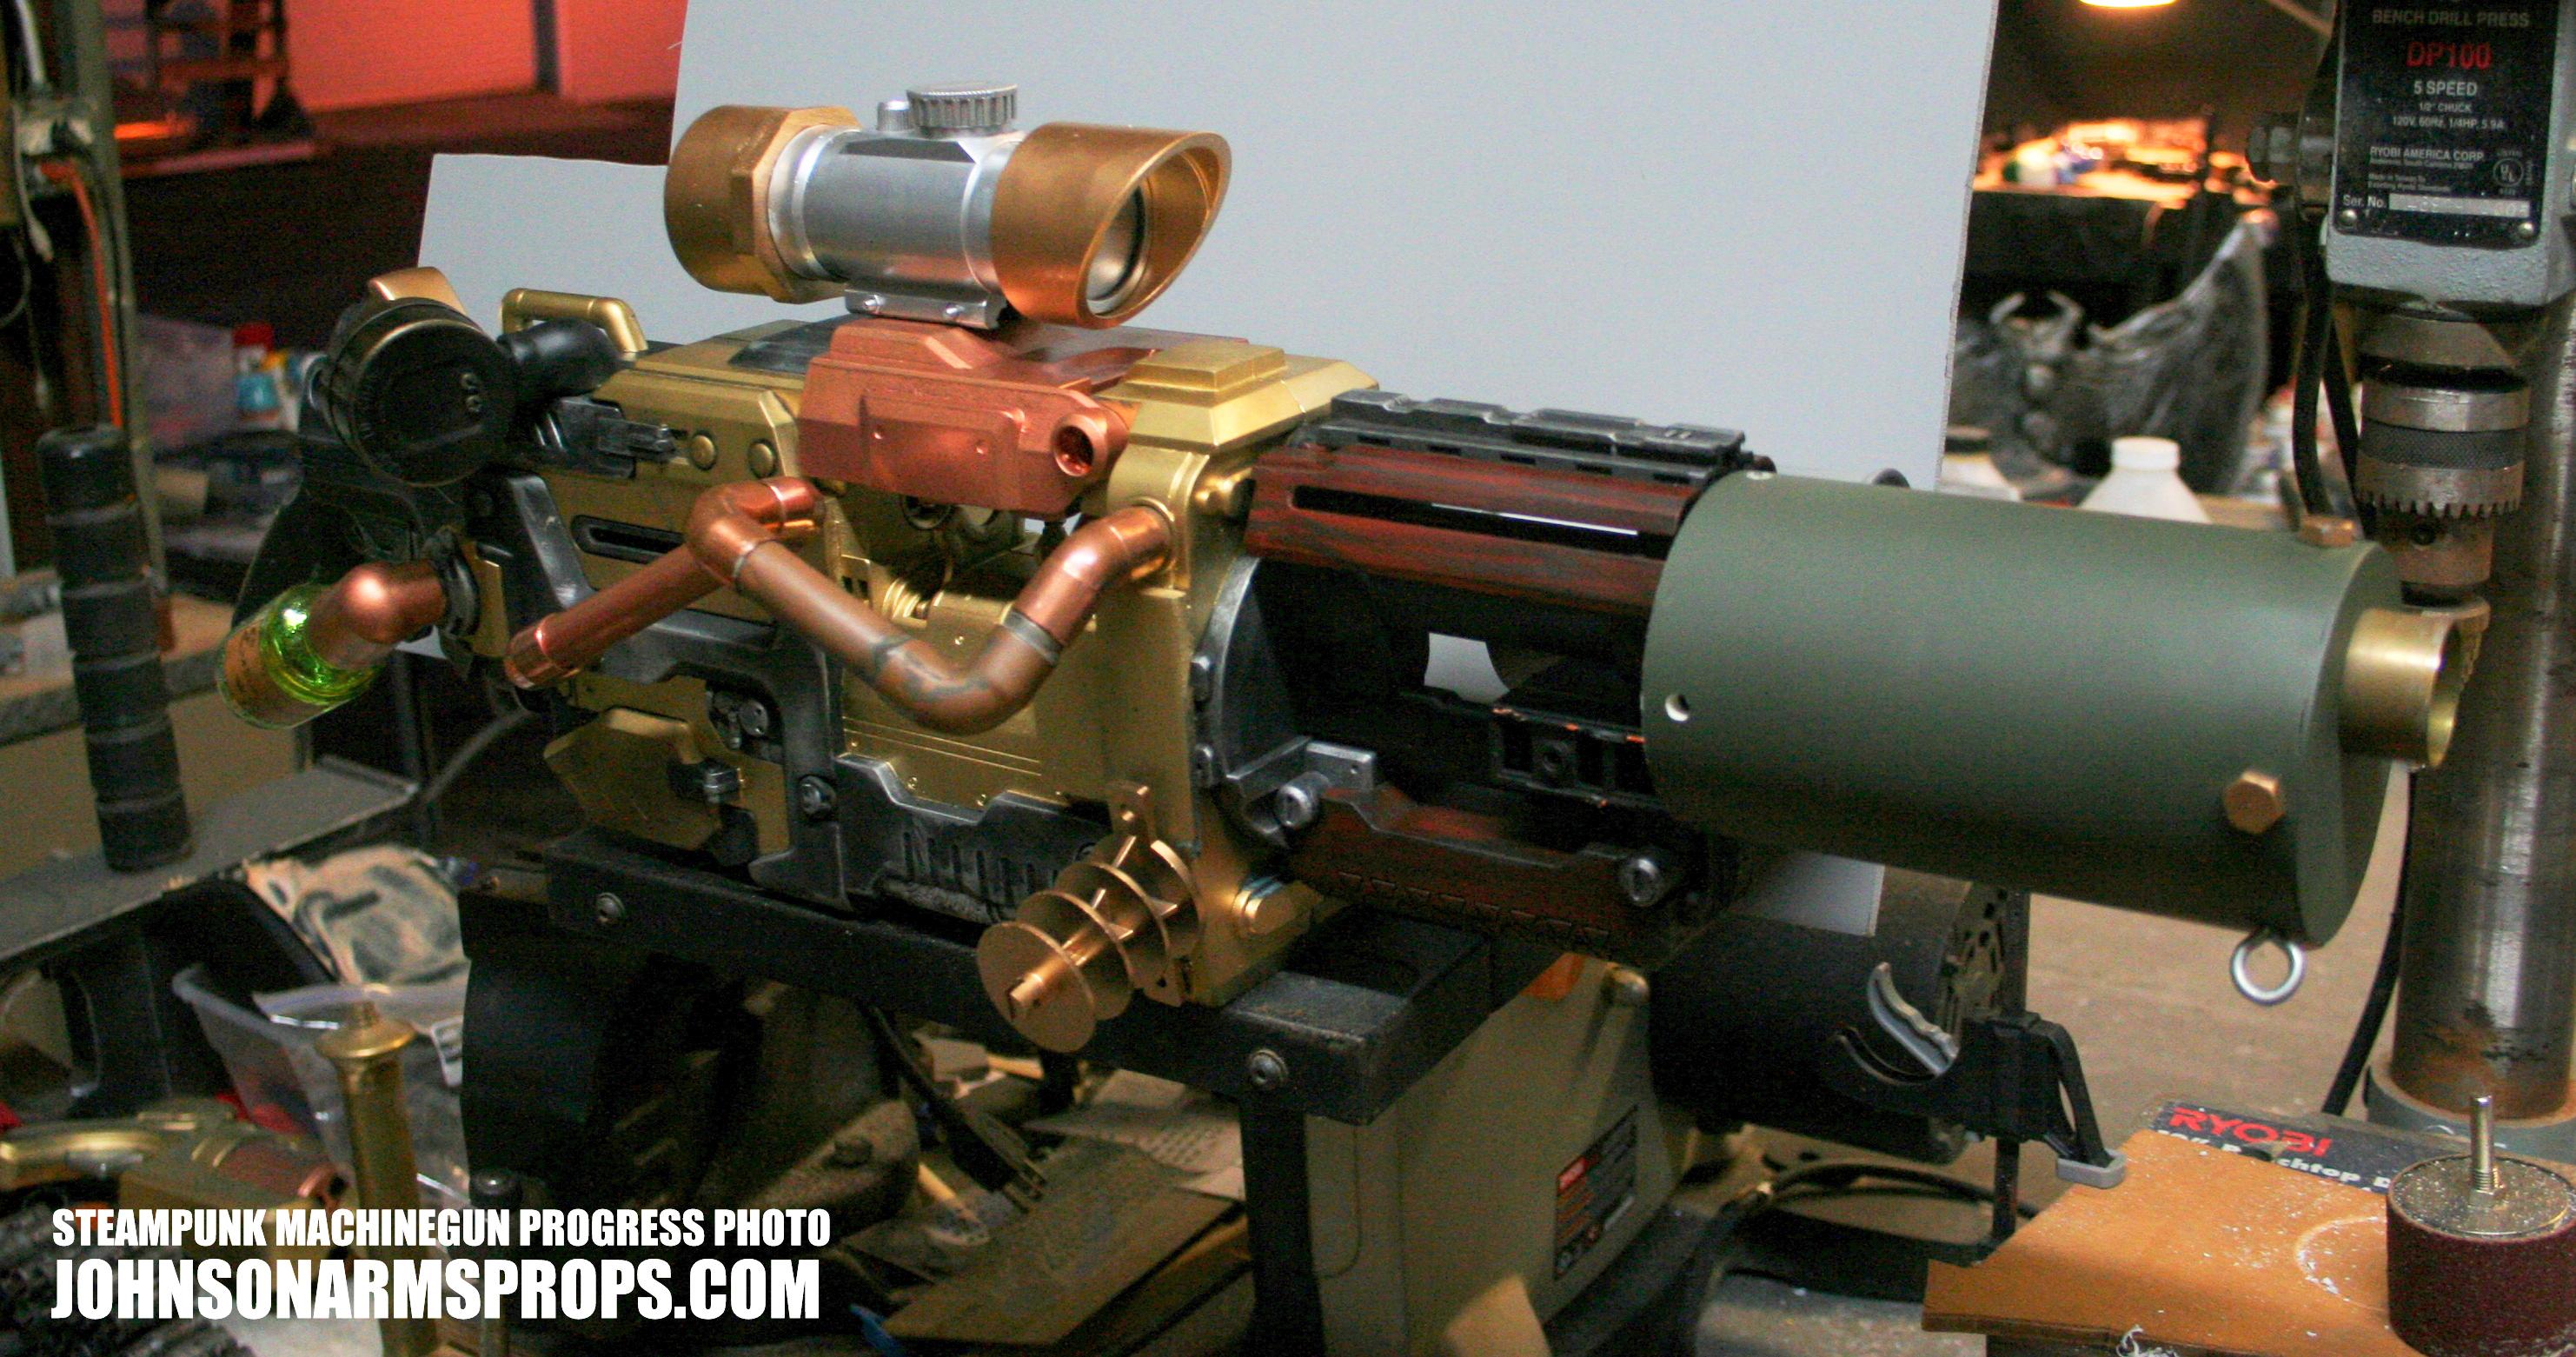 Steampunk Machine Gun Progress by JohnsonArms